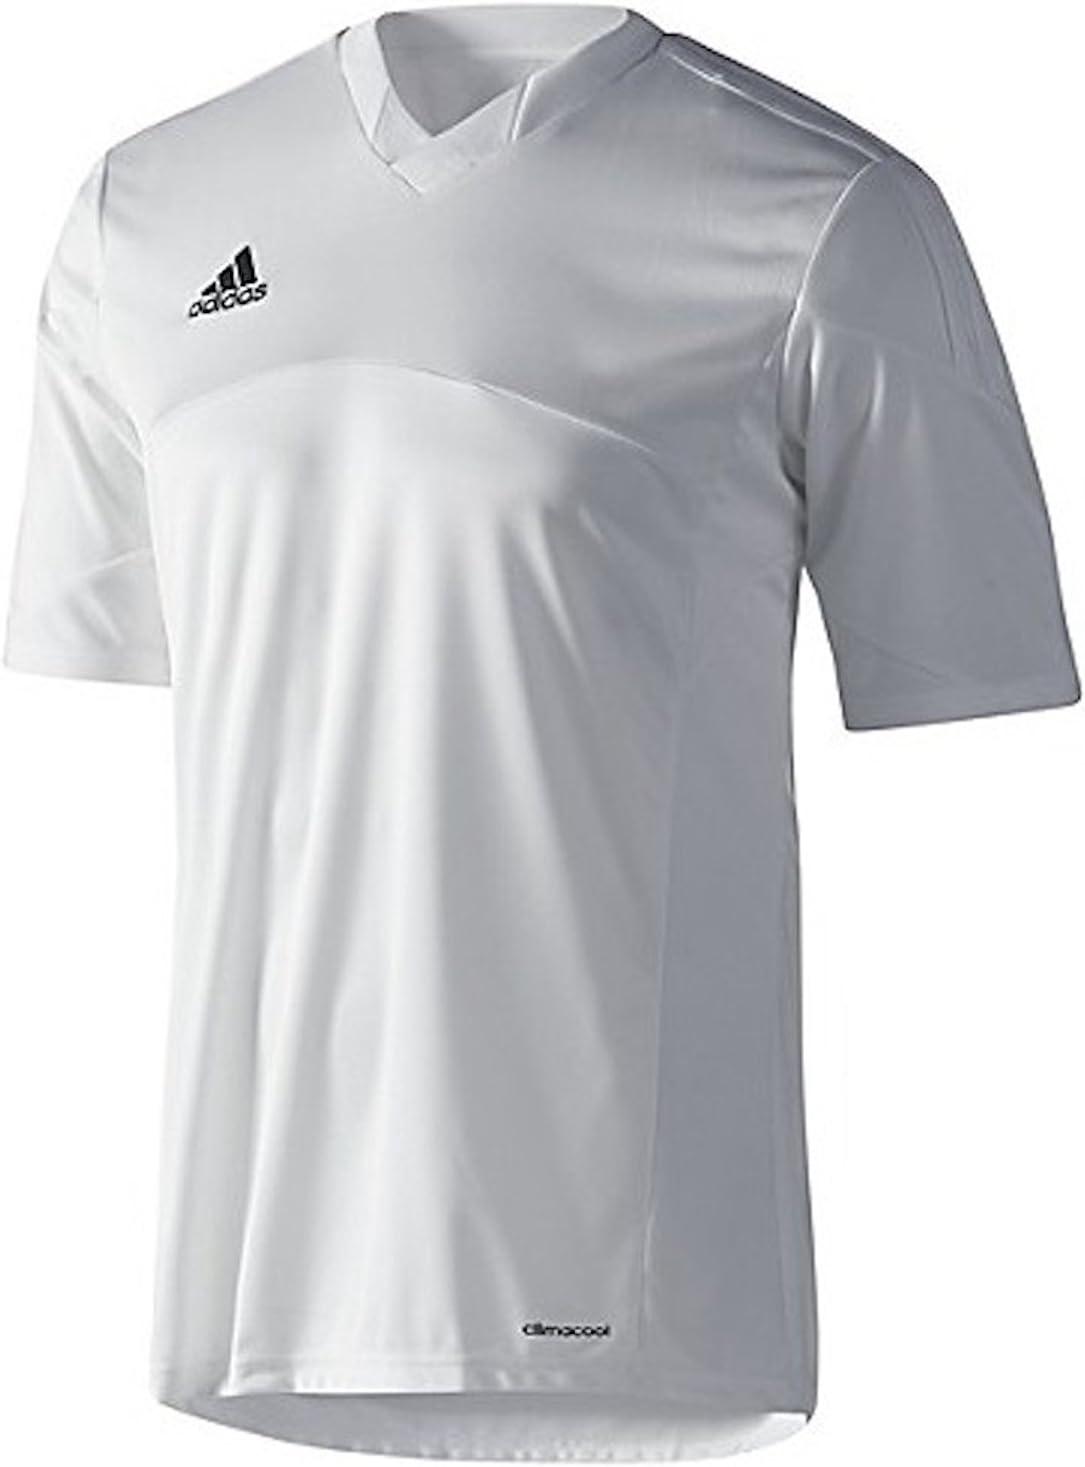 Adidas Mens Climacool Tiro 13 Short Sleeve Jersey ... - Amazon.com